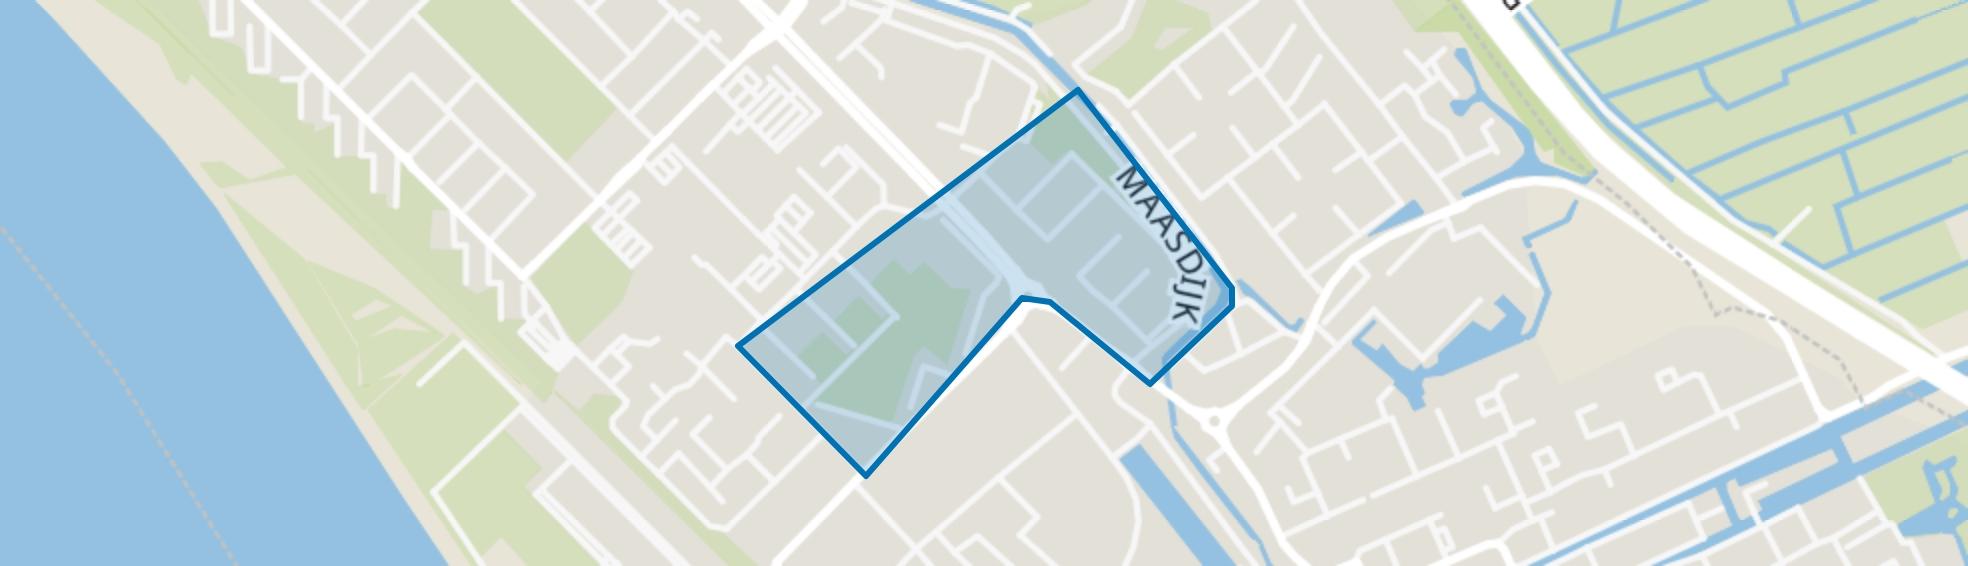 Componistenbuurt, Maassluis map